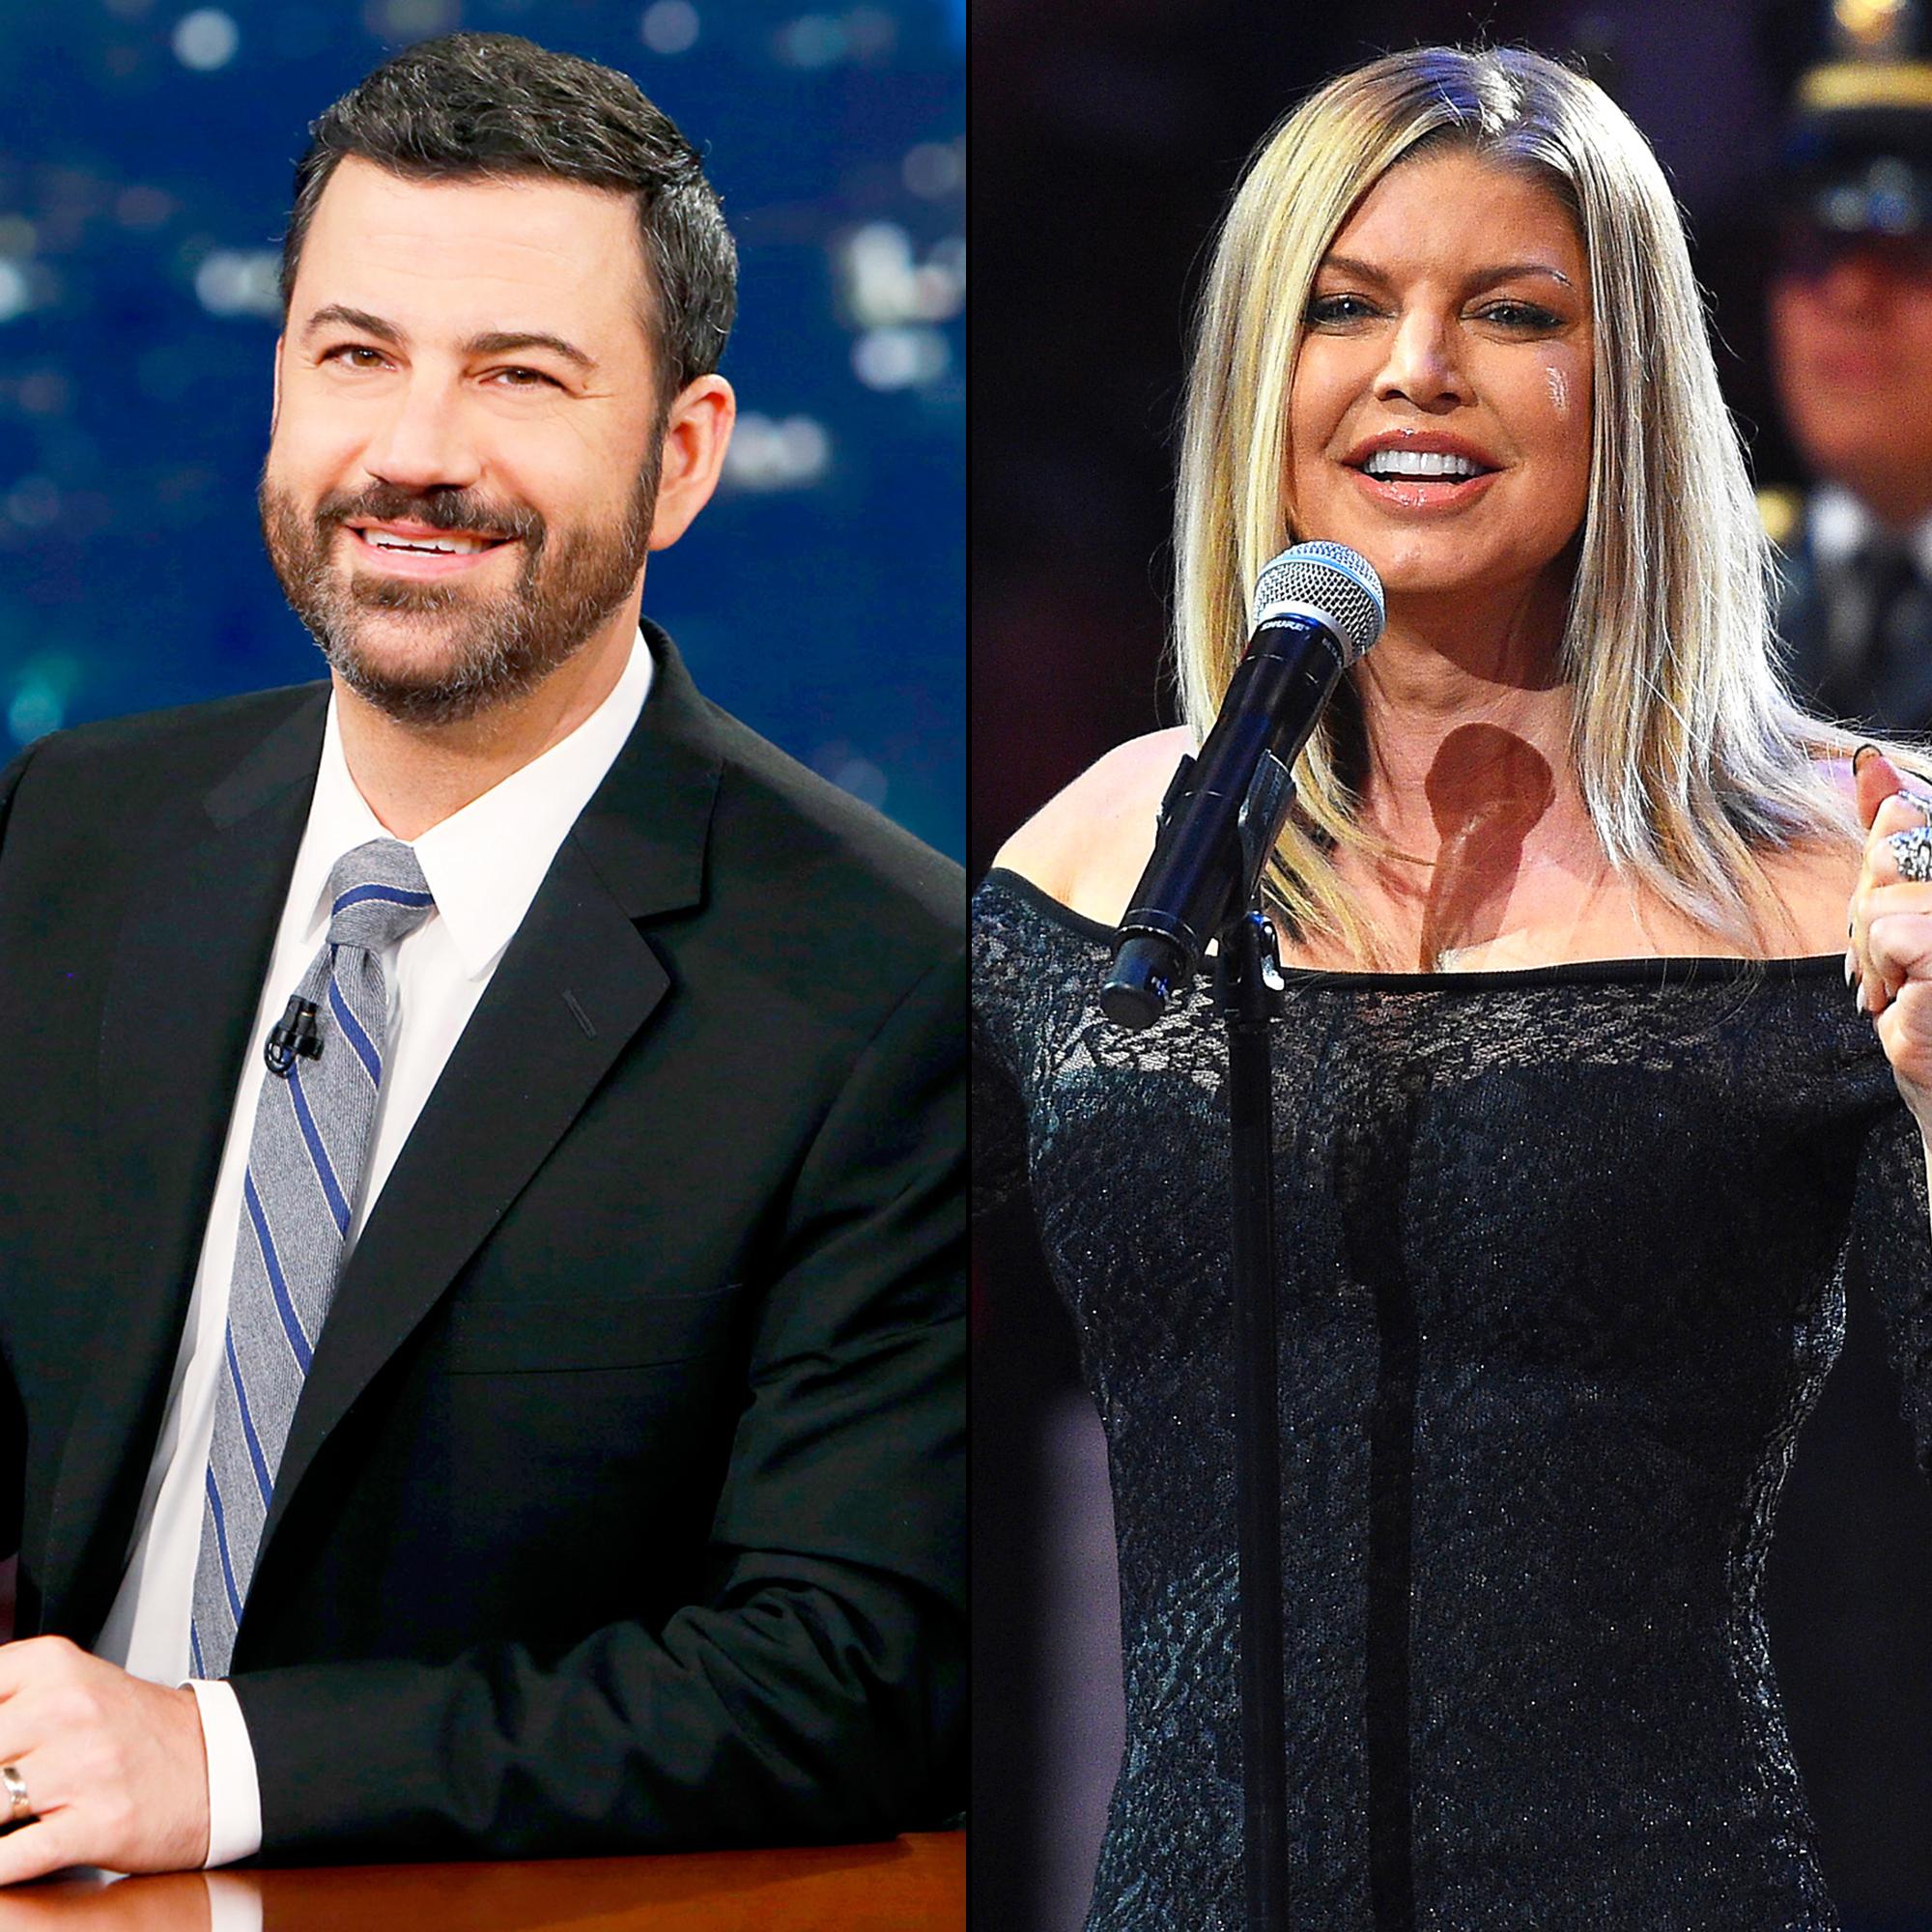 Jimmy Kimmel Explains His Smiling Reaction To Fergies National